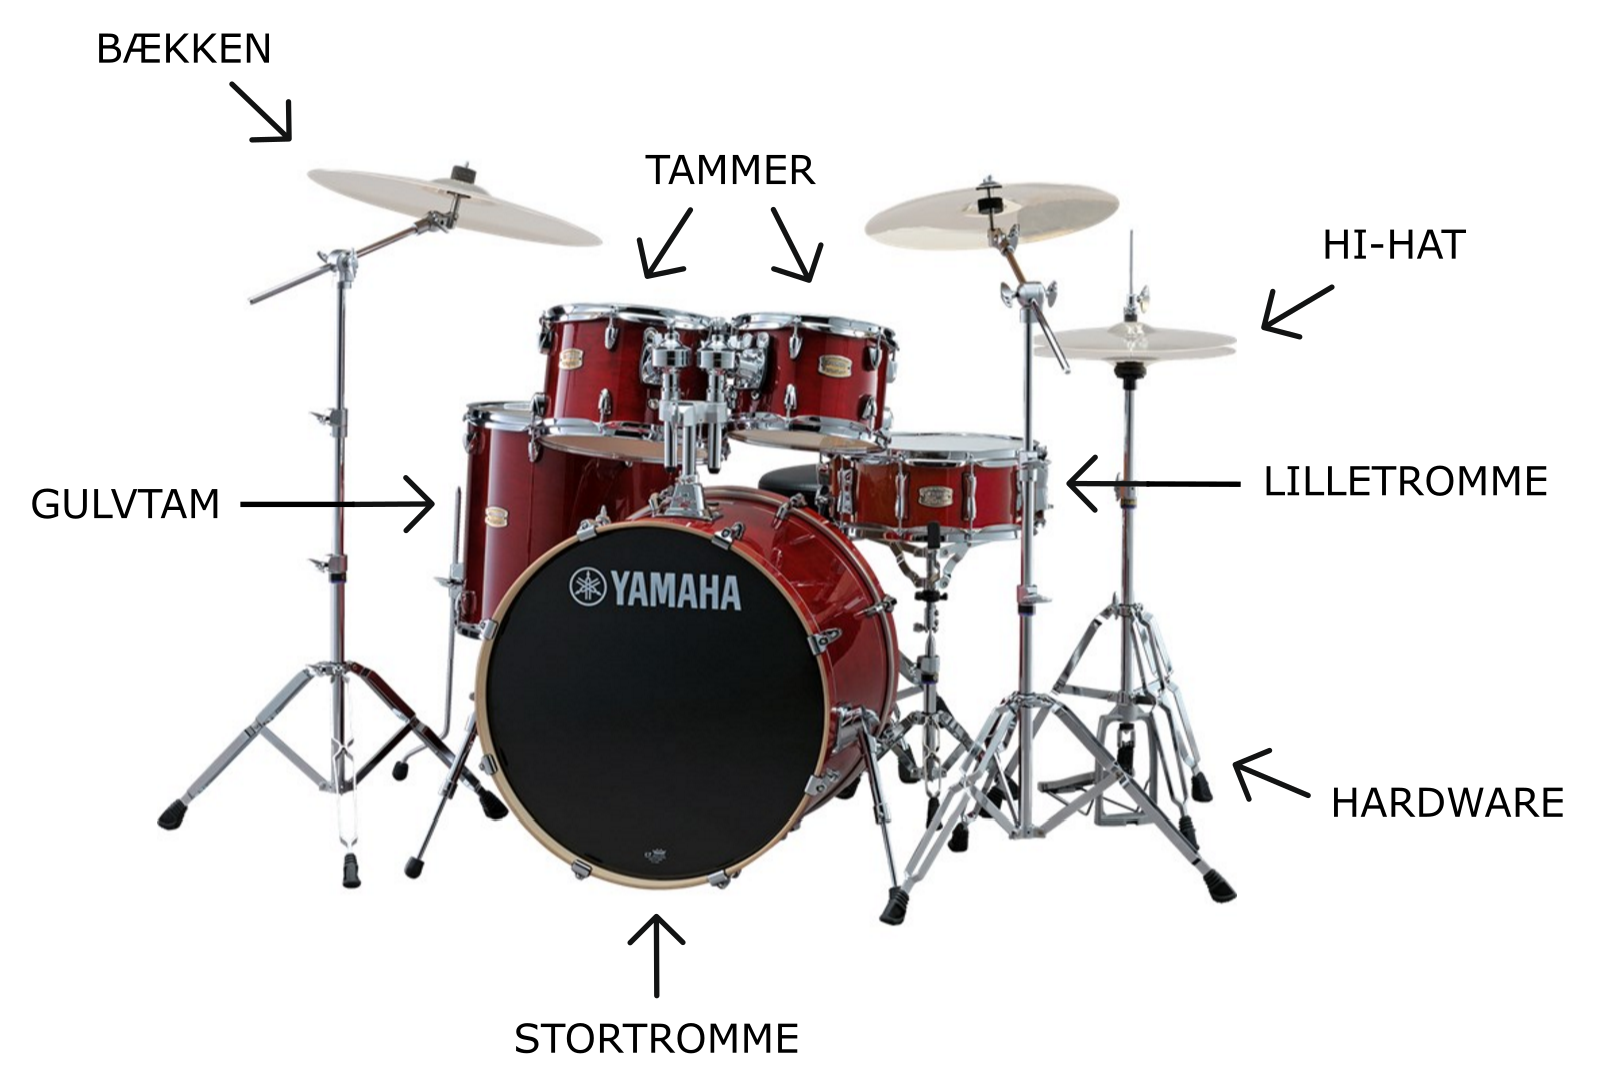 Drum set parts